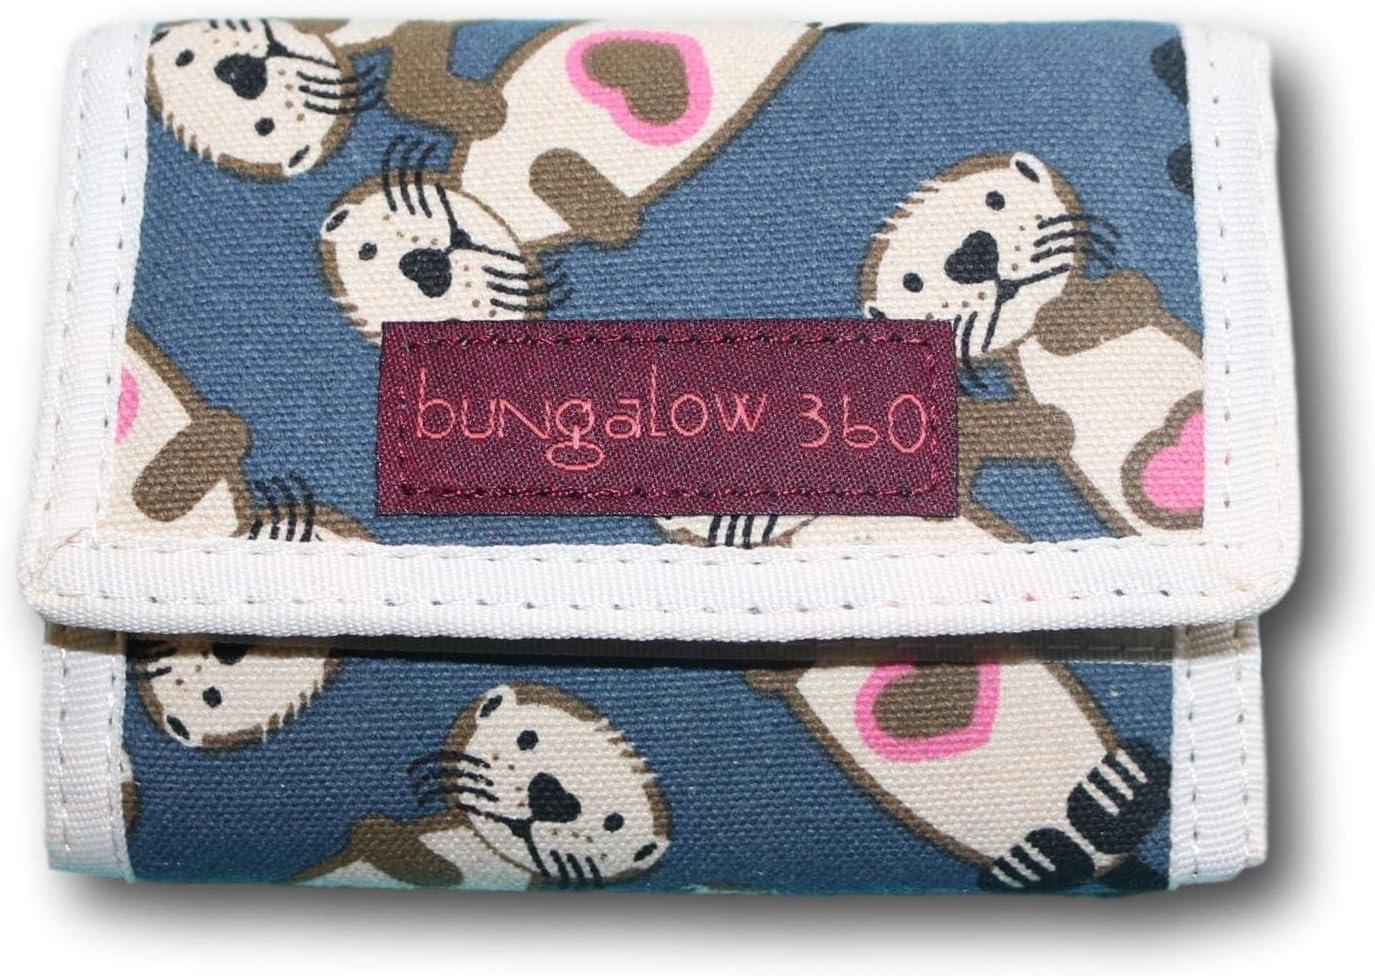 Bungalow 360 Trifold Vegan Wallet (Sea Otter)